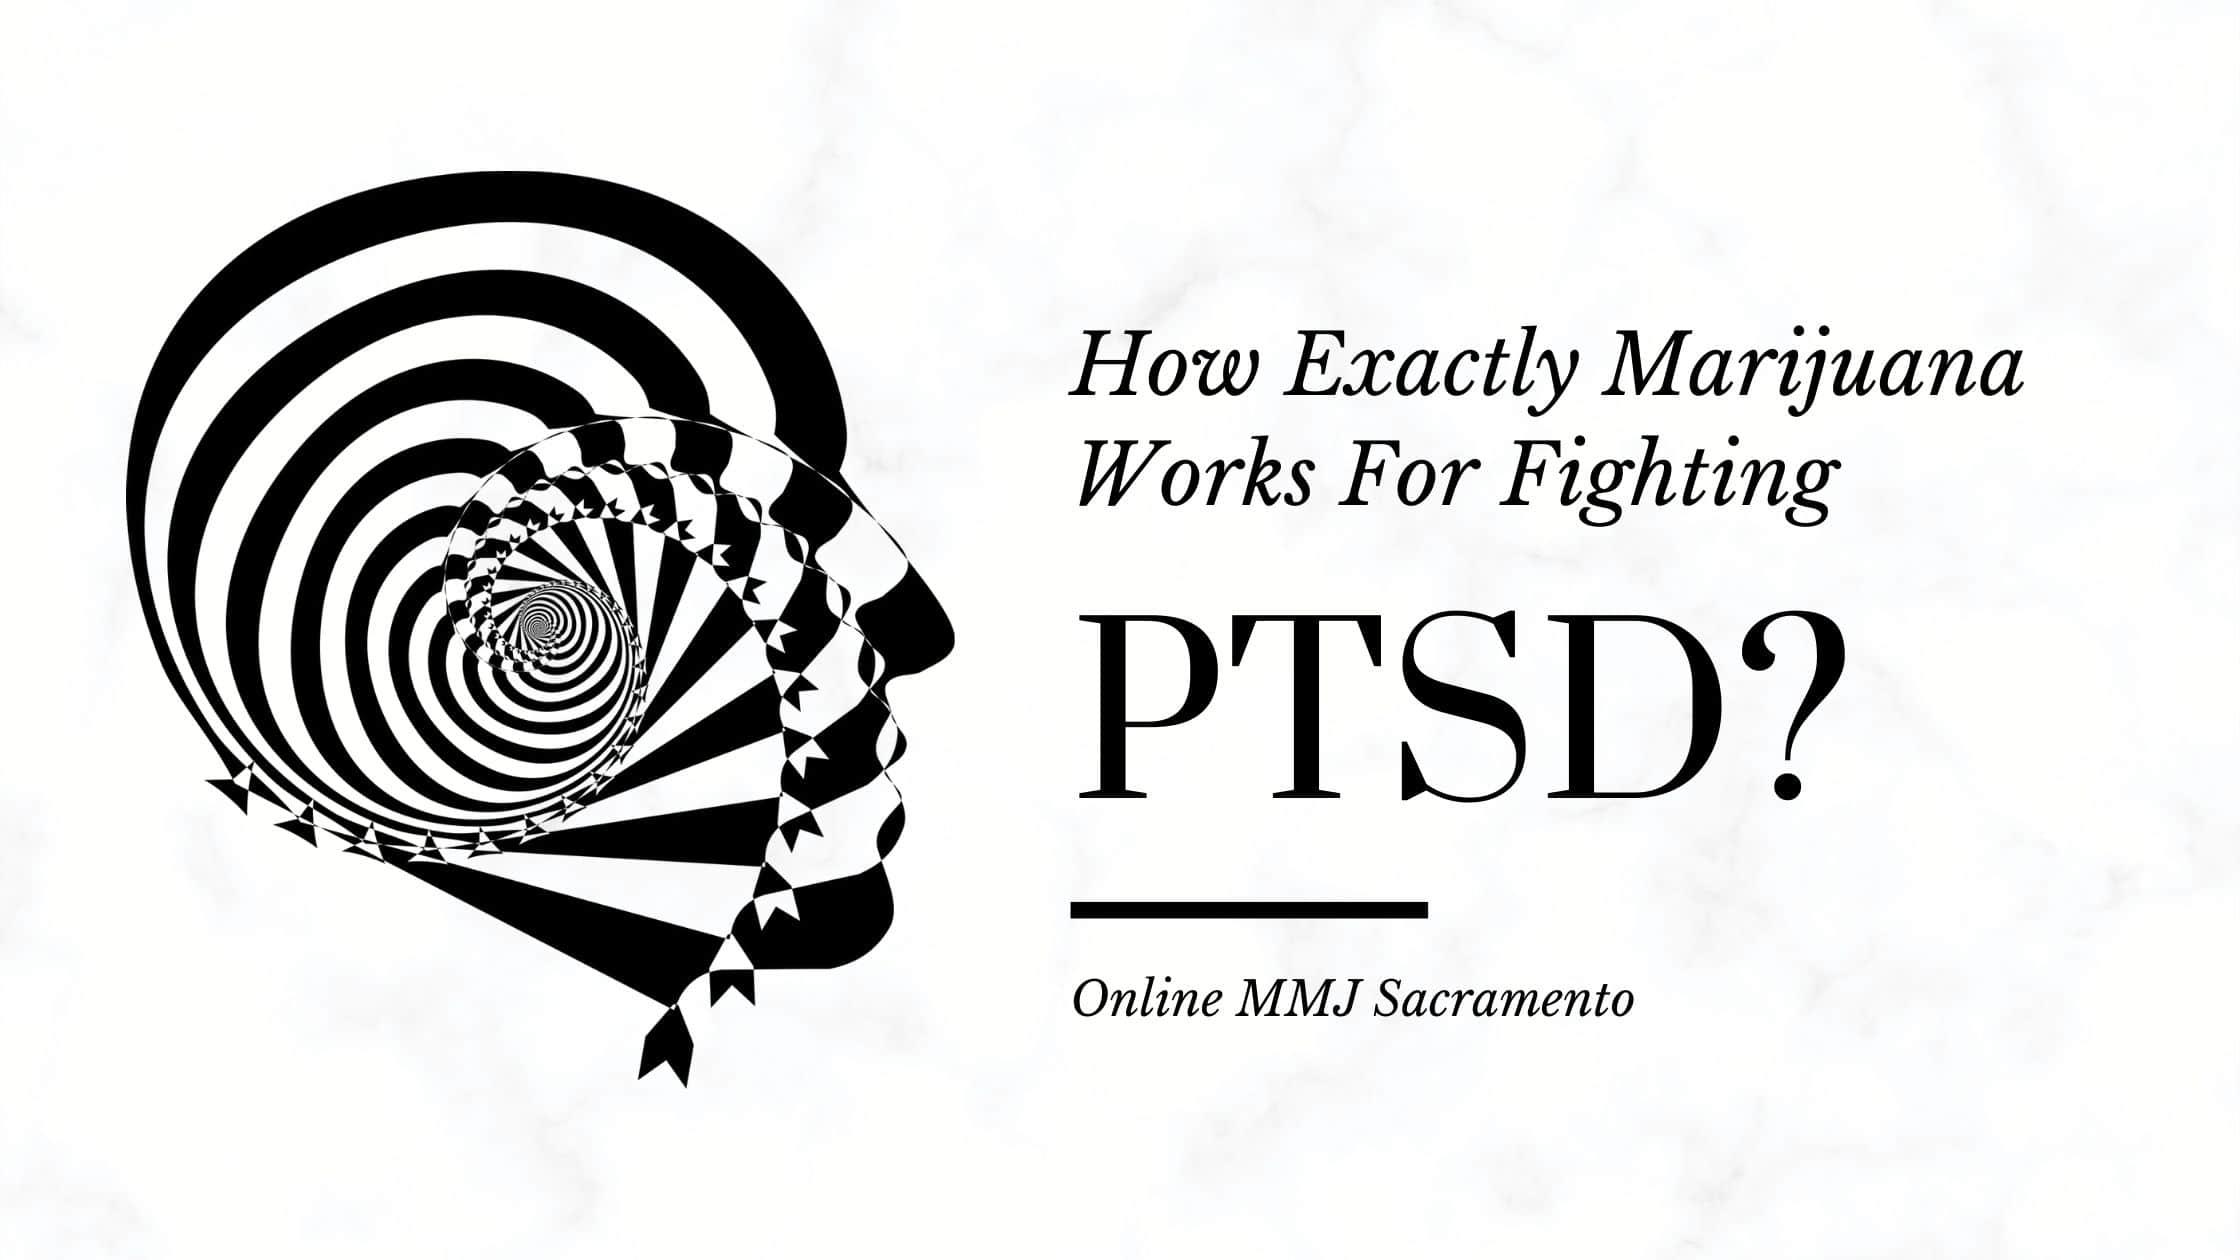 How Exactly Marijuana Works For  Fighting PTSD?